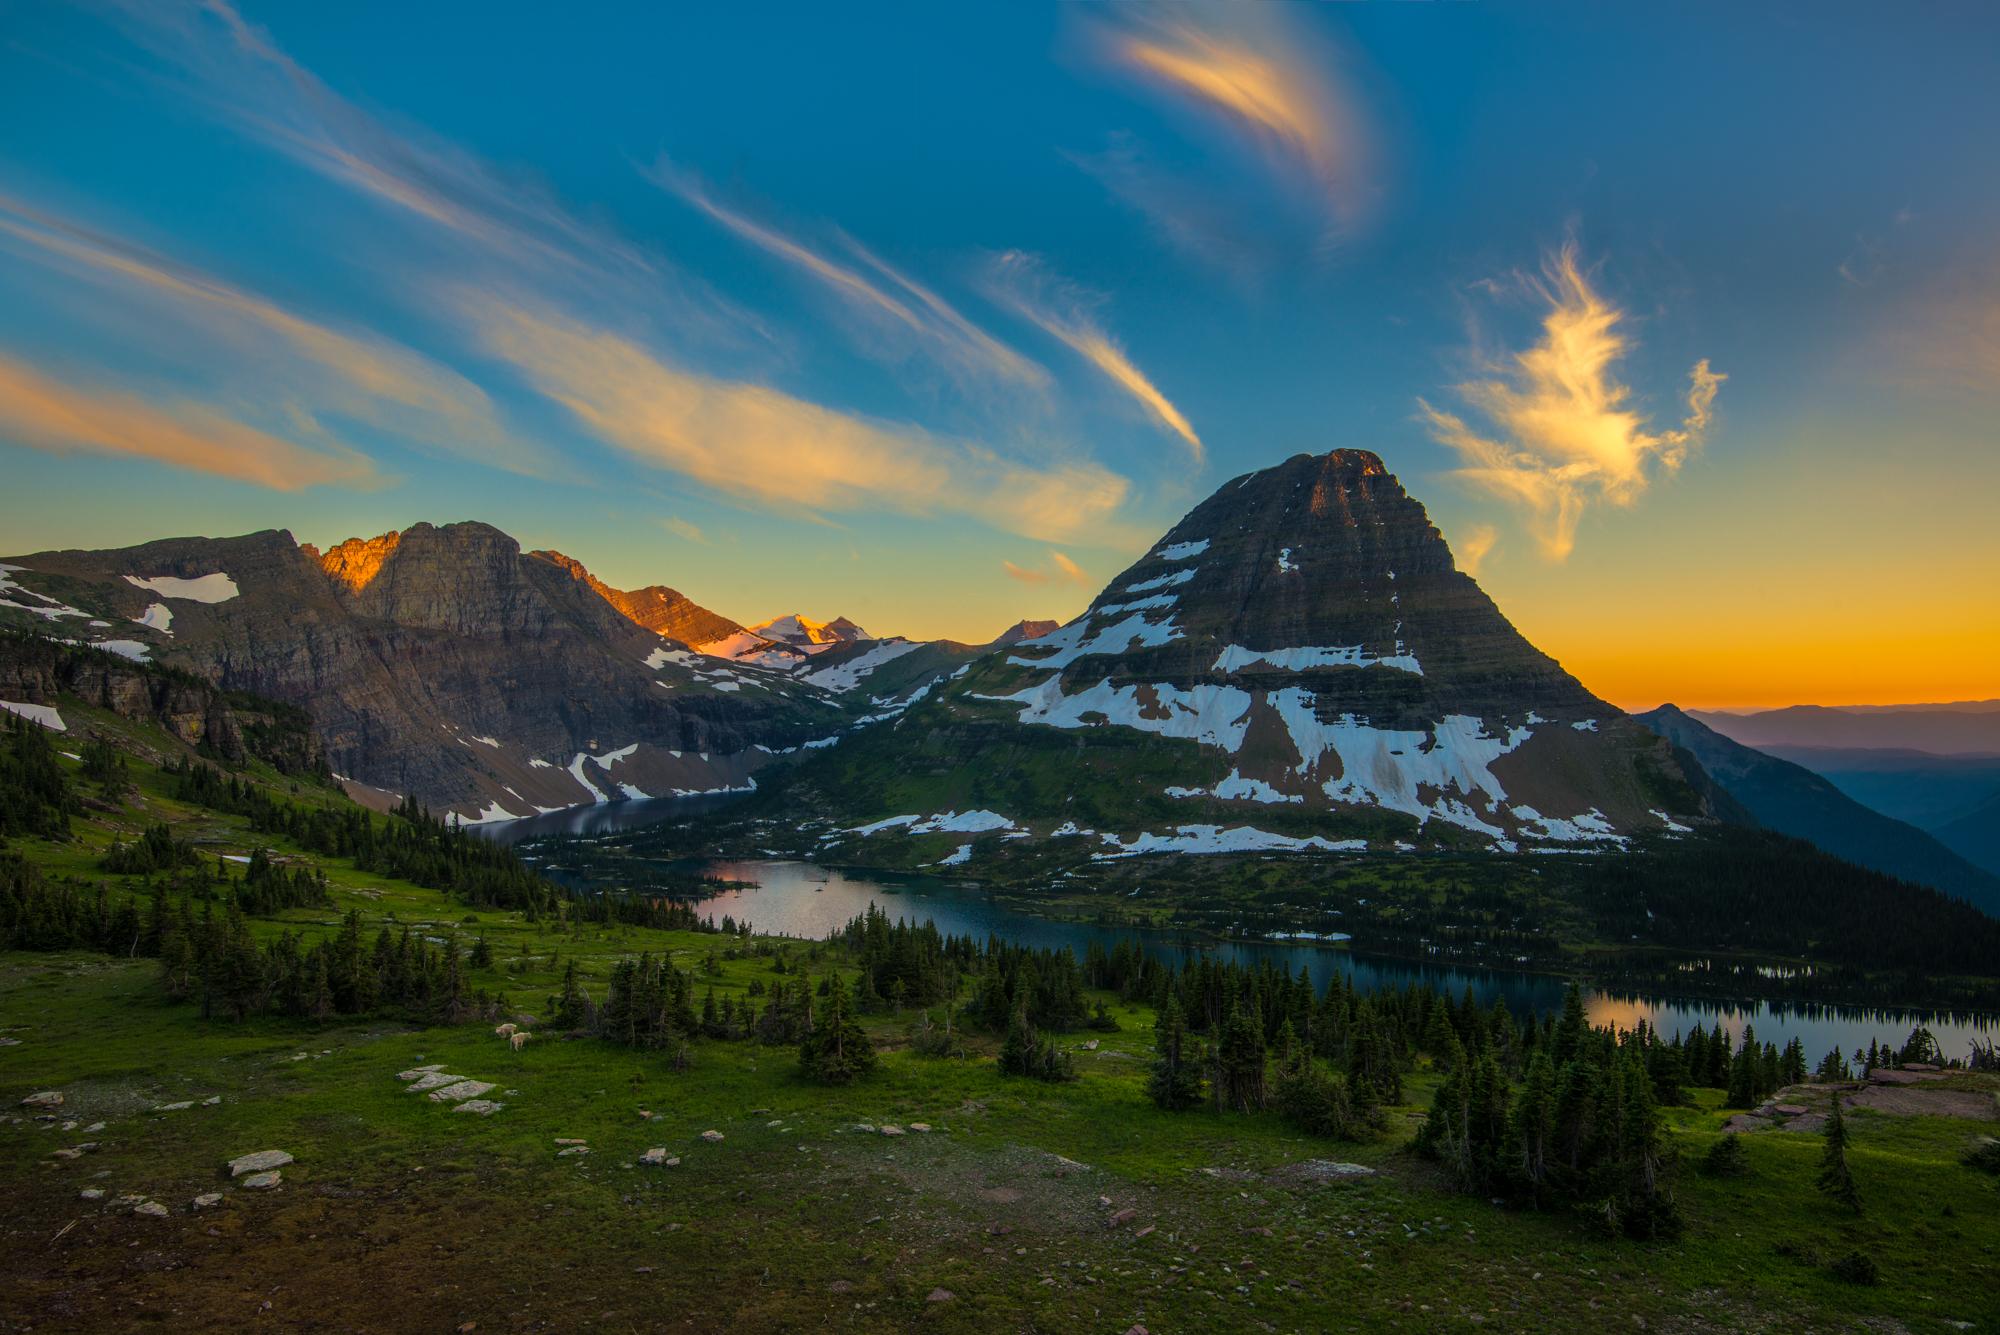 GlacierNP_071817._CVB3939-HDR-Edit.jpg